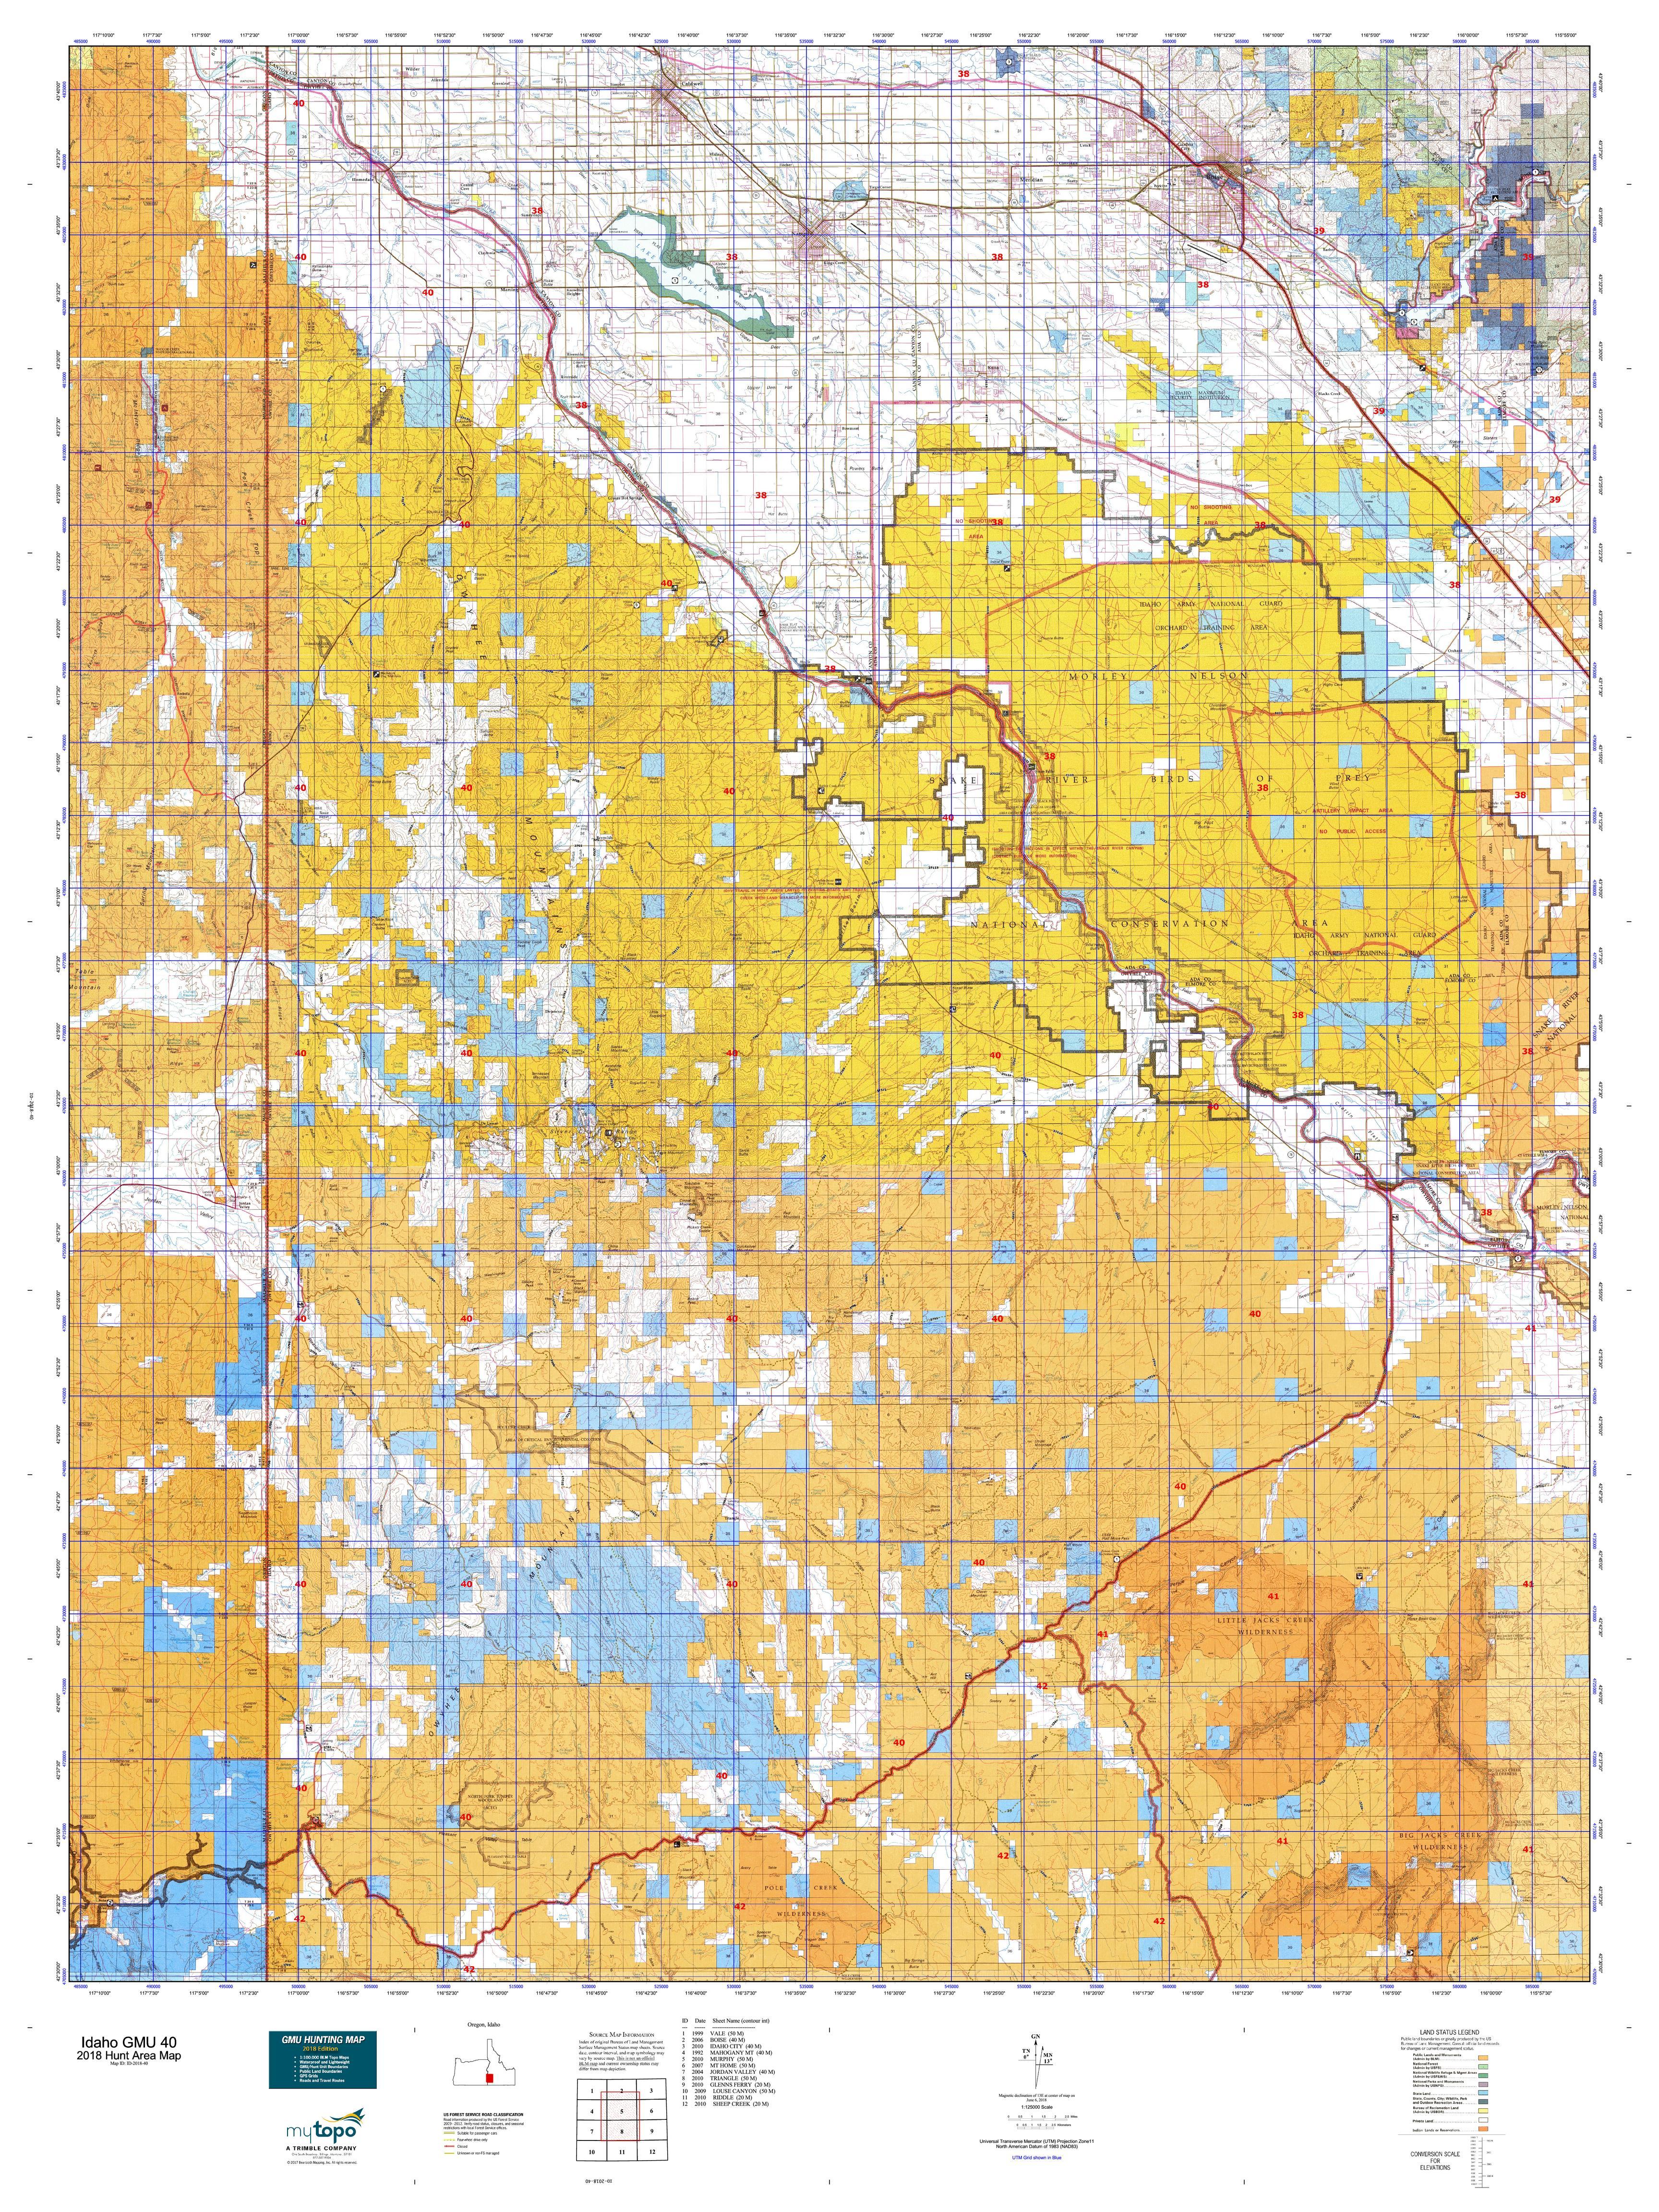 Idaho GMU 40 Map | MyTopo